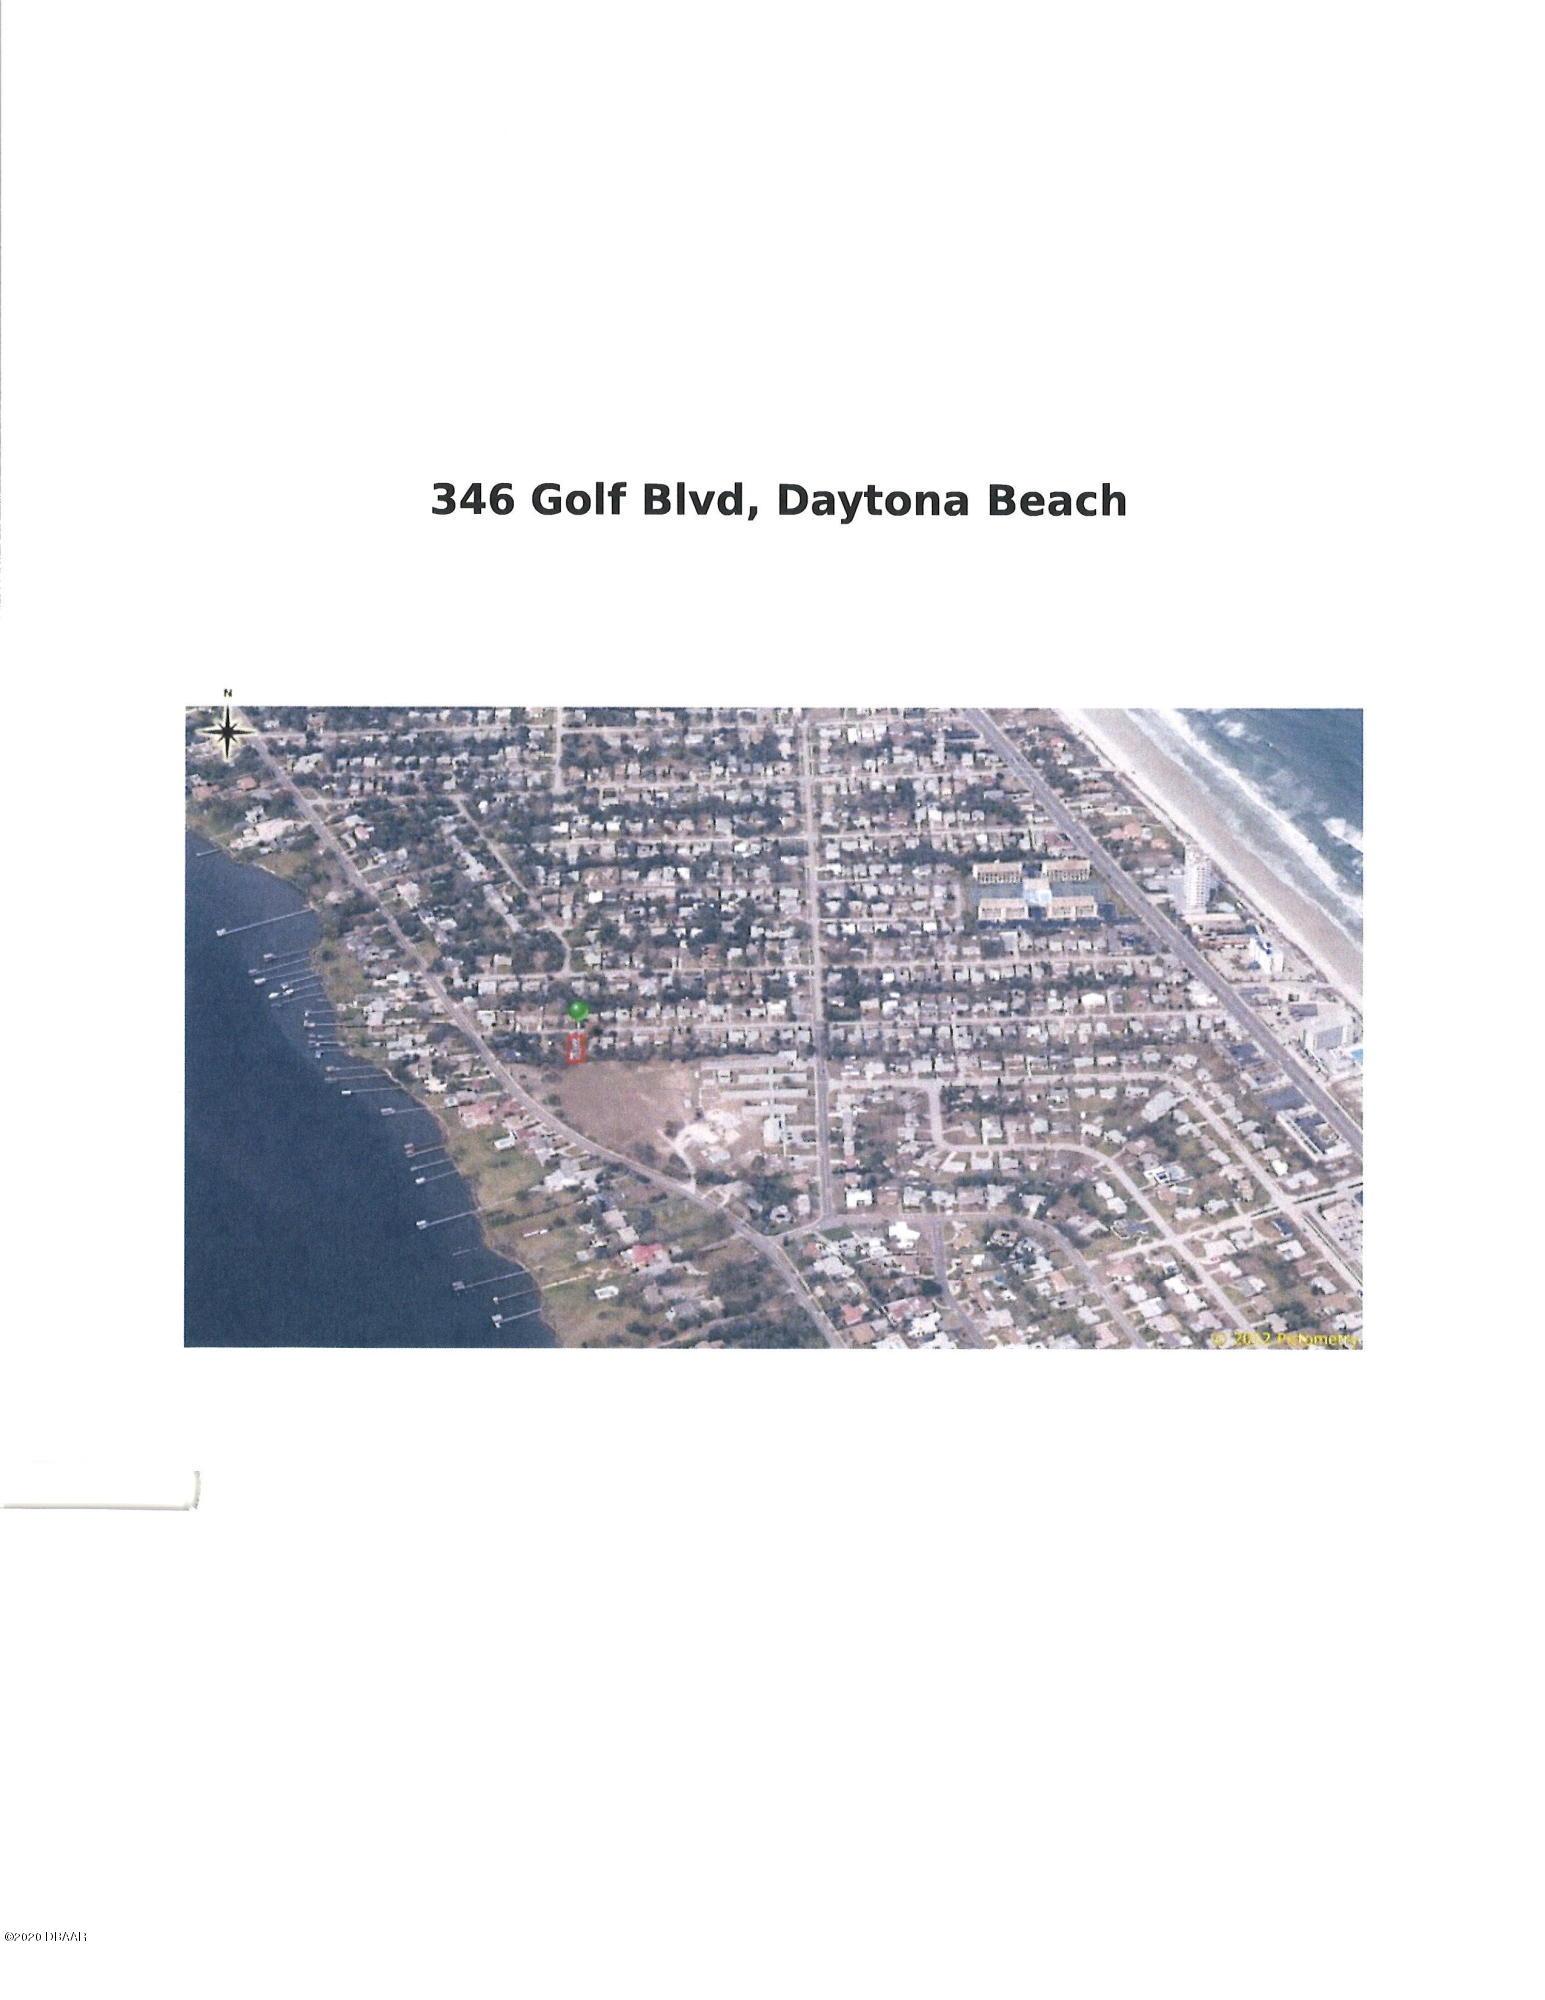 346 Golf Daytona Beach - 4